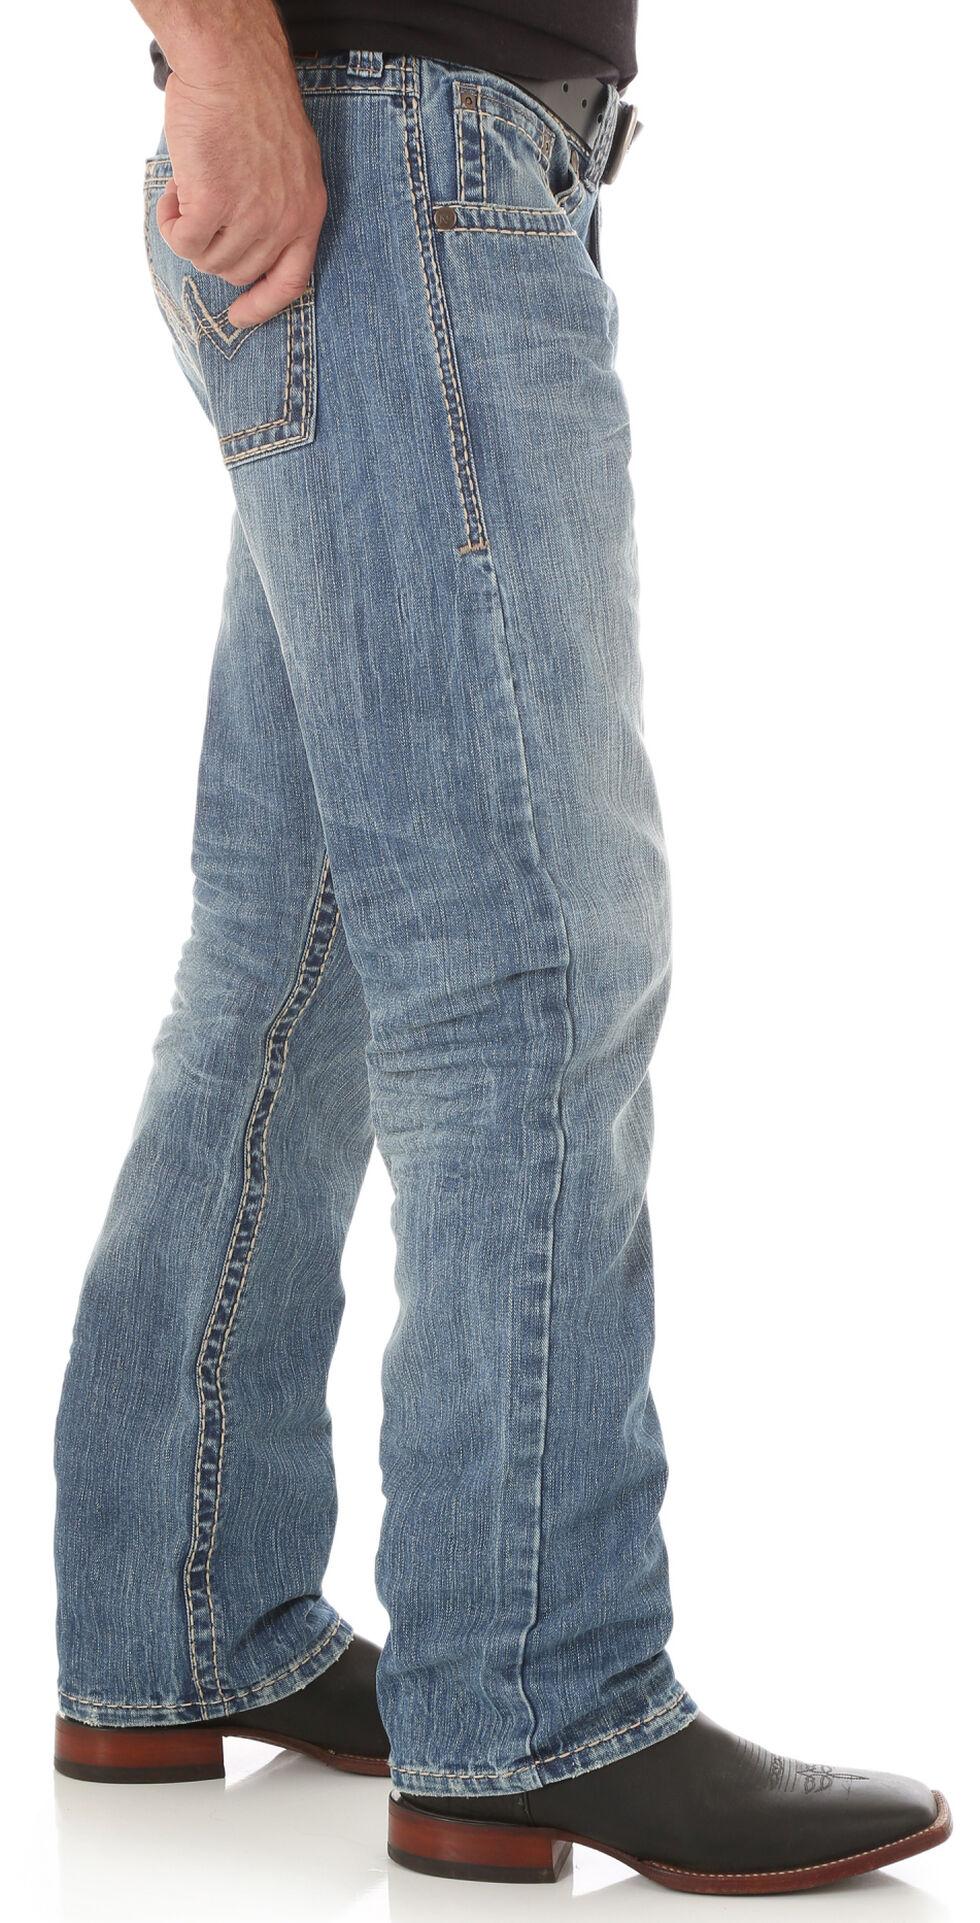 Wrangler Rock 47 Men's Denim Jeans - Slim Fit, Indigo, hi-res